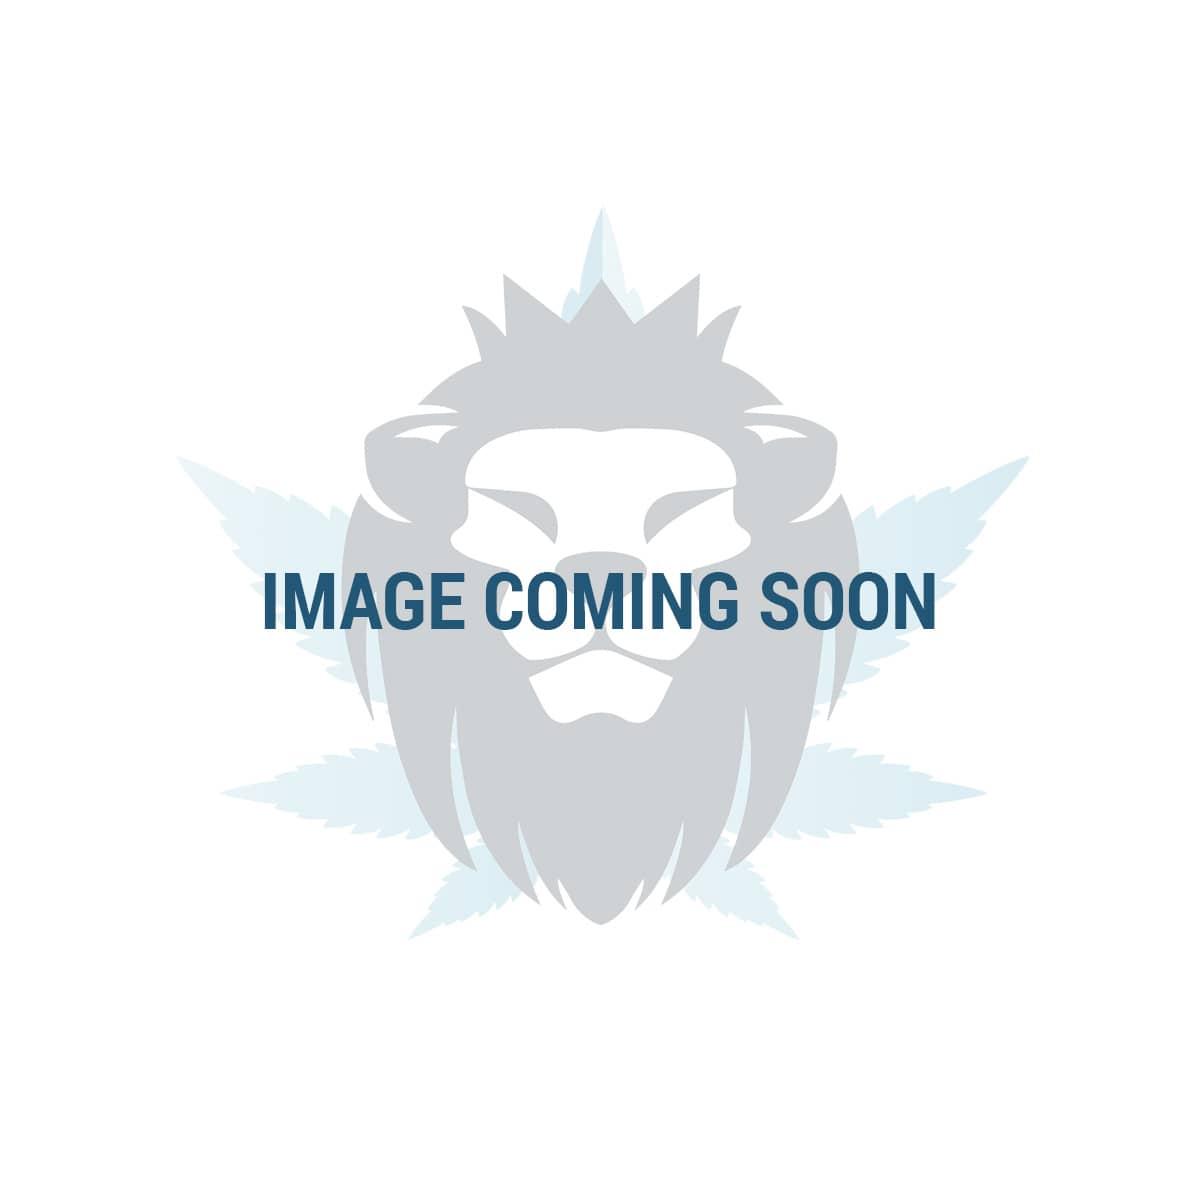 Havana cigarette scales 500g x 0.01g